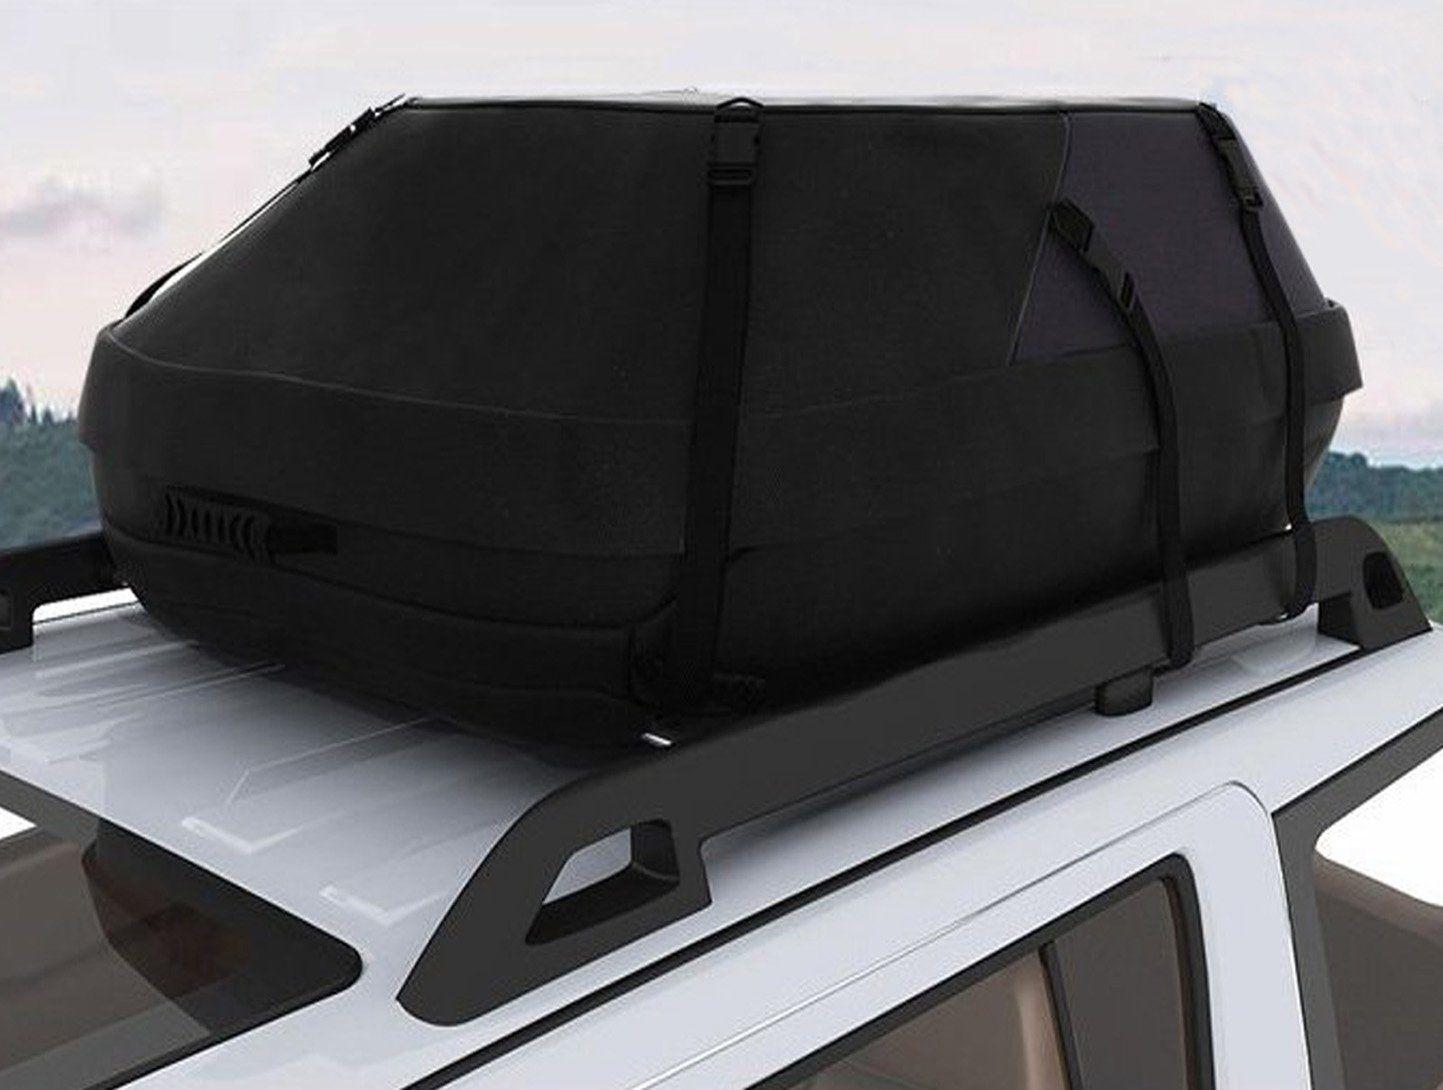 Kaluo 15 Cubic Universal Waterproof Car Top Carrier Bag